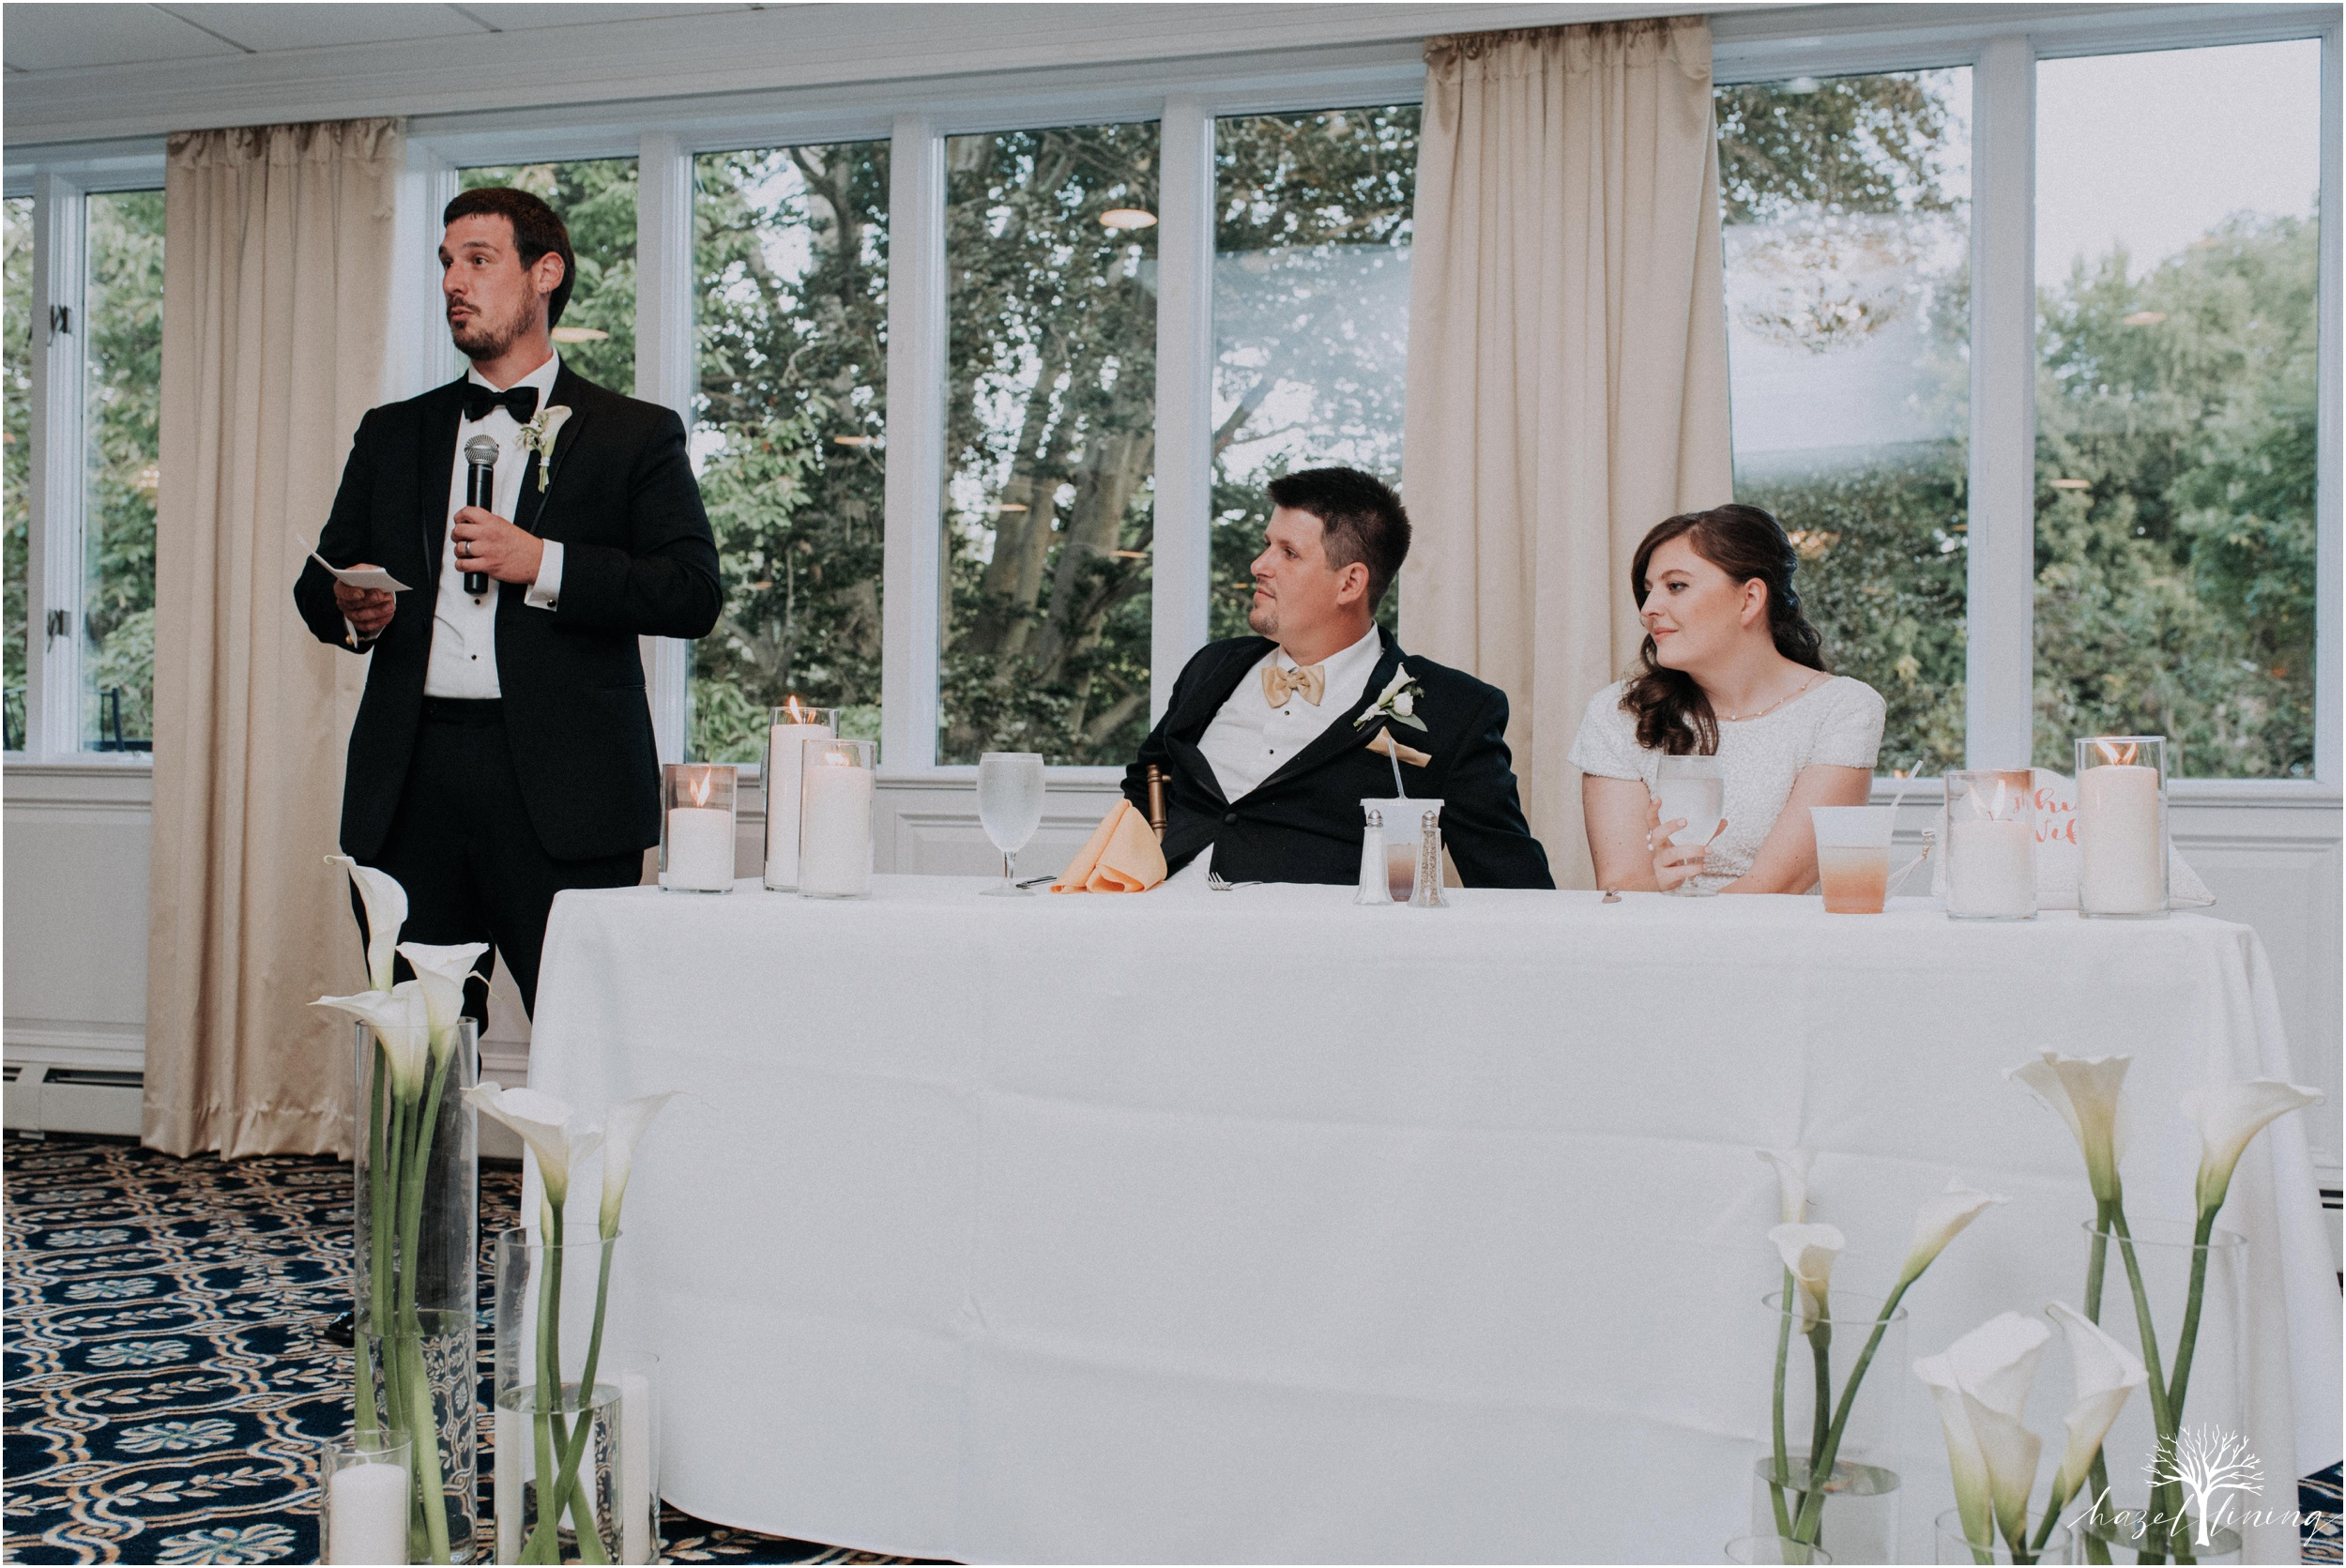 elizabeth-doelp-andrew-foreback-middletown-country-club-summer-langhorne-pennsylvania-wedding-hazel-lining-travel-wedding-elopement-photography_0138.jpg